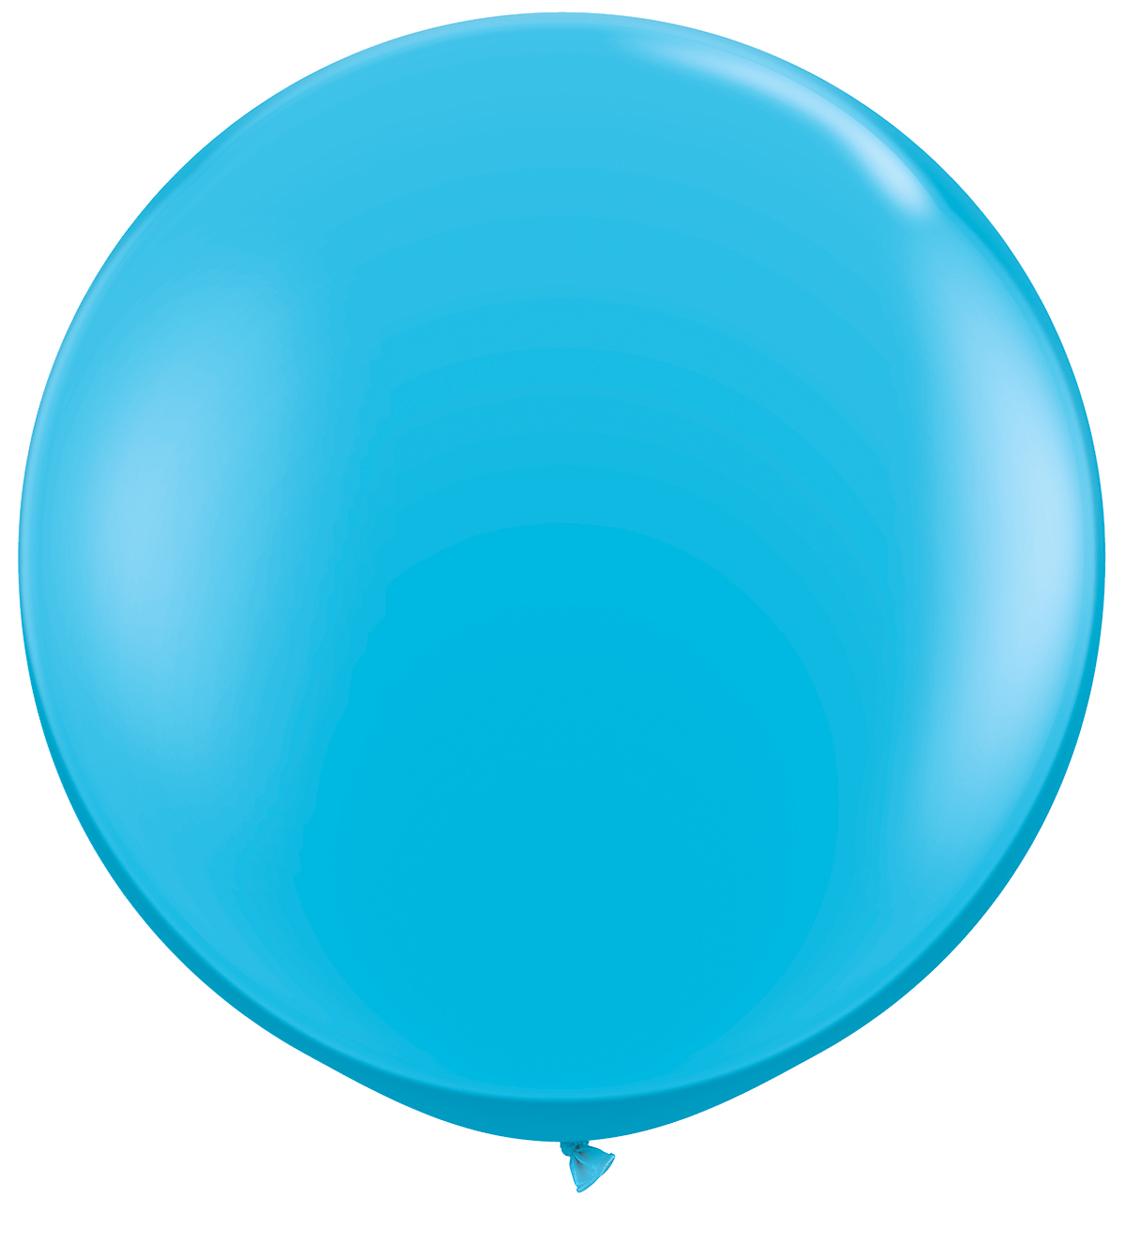 Turquoise Balloon Cliparts.